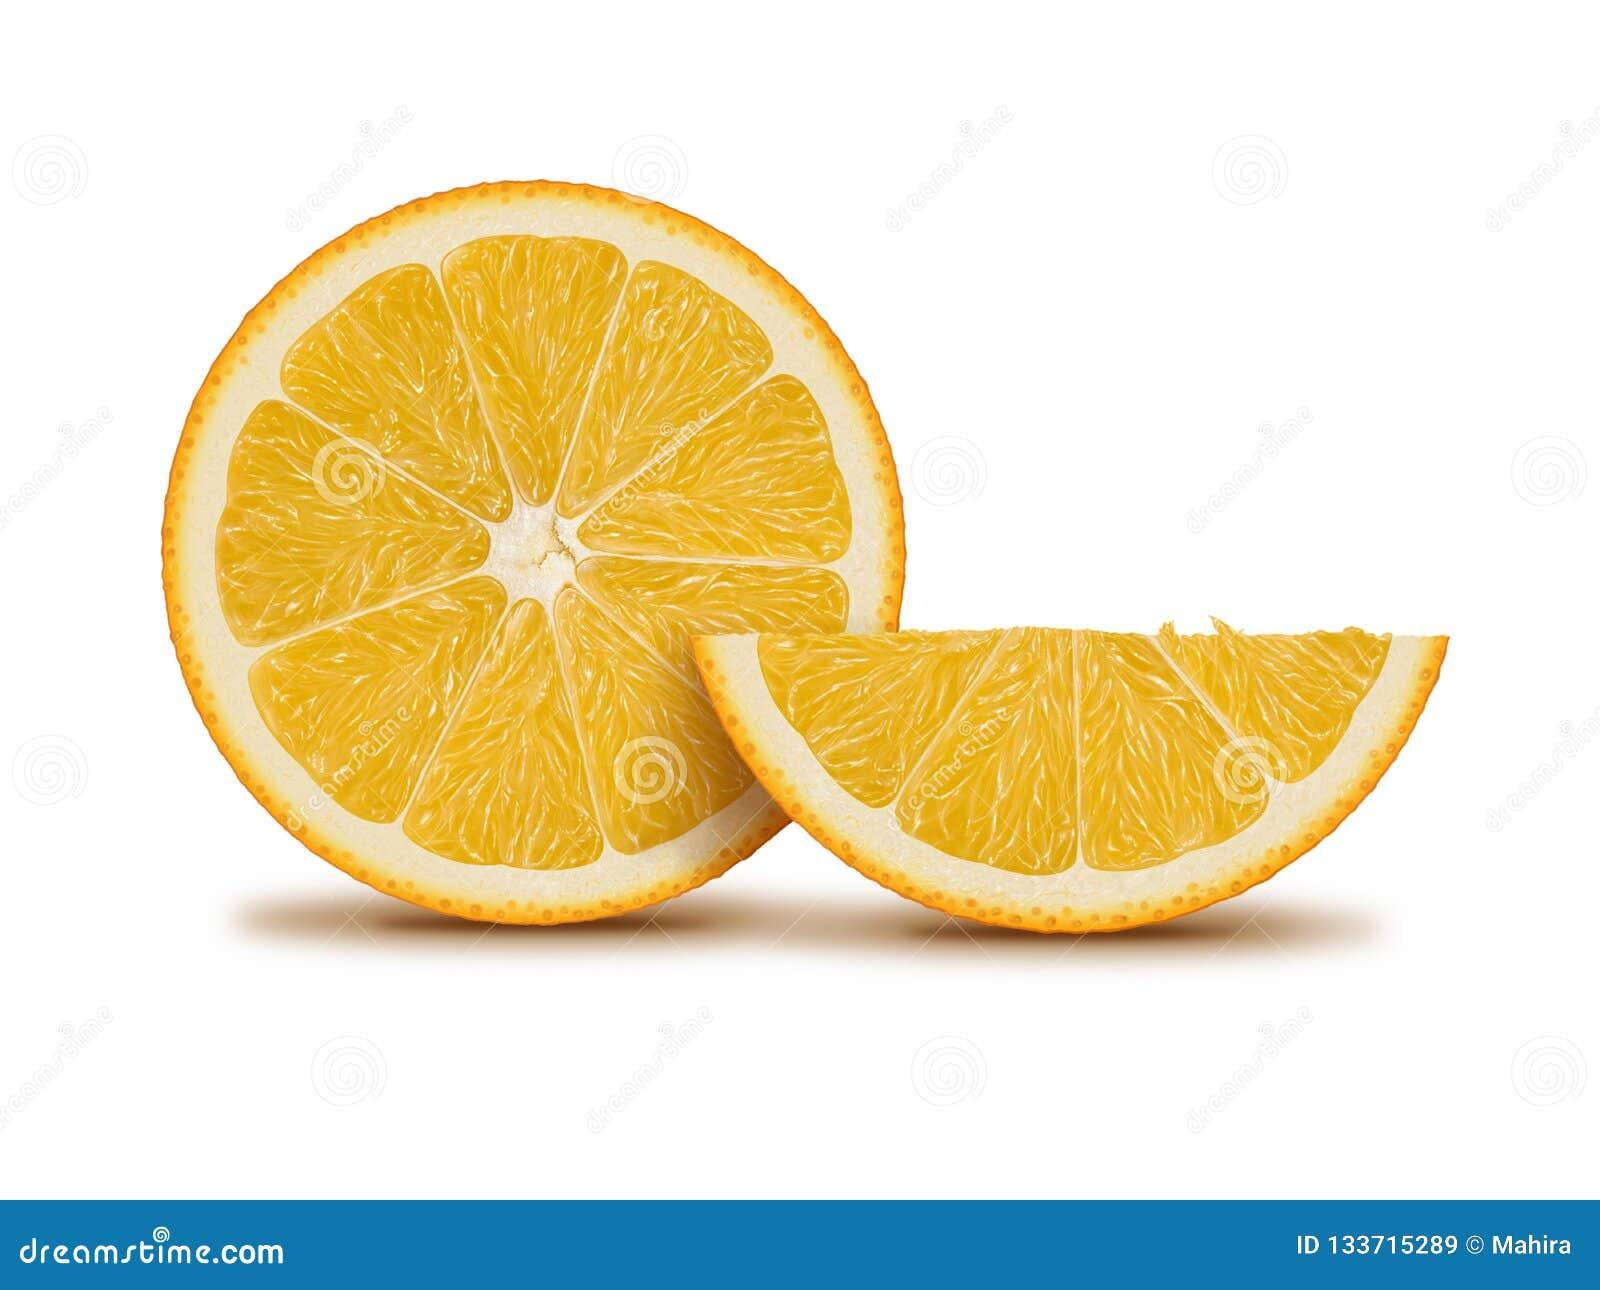 Orange fruit and slice illustration